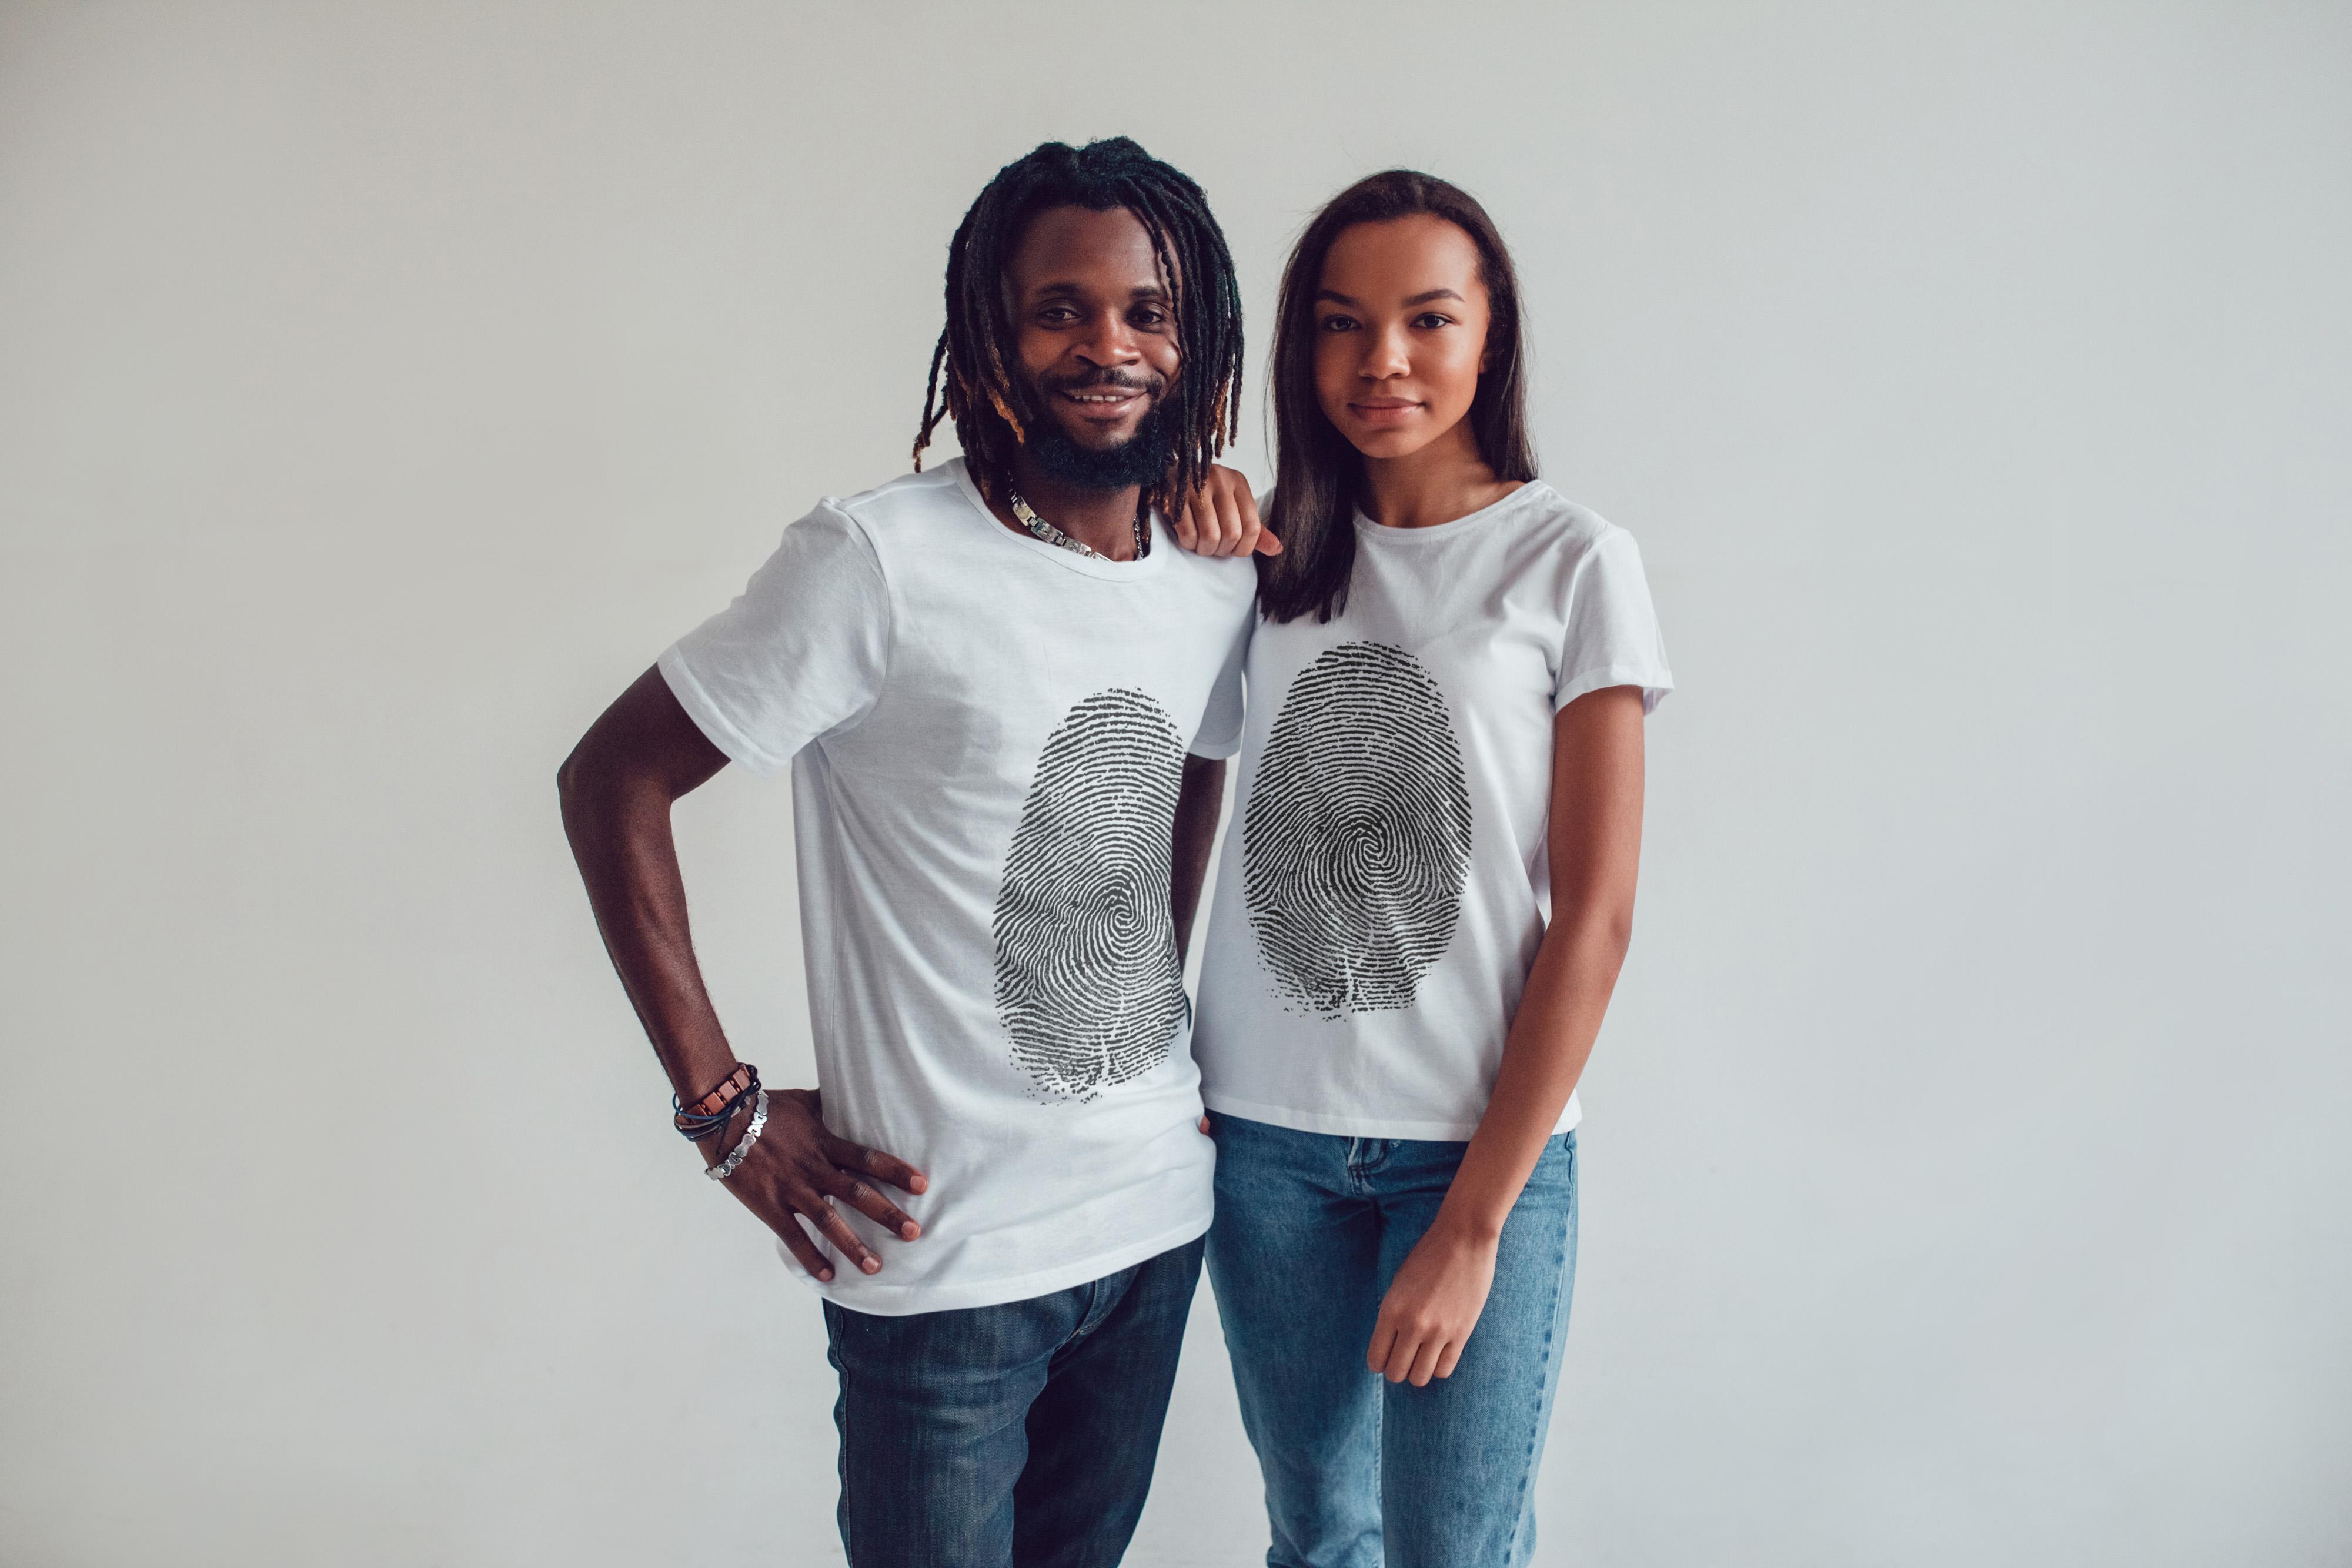 T-Shirt Mock-Up 2018 #1 example image 2